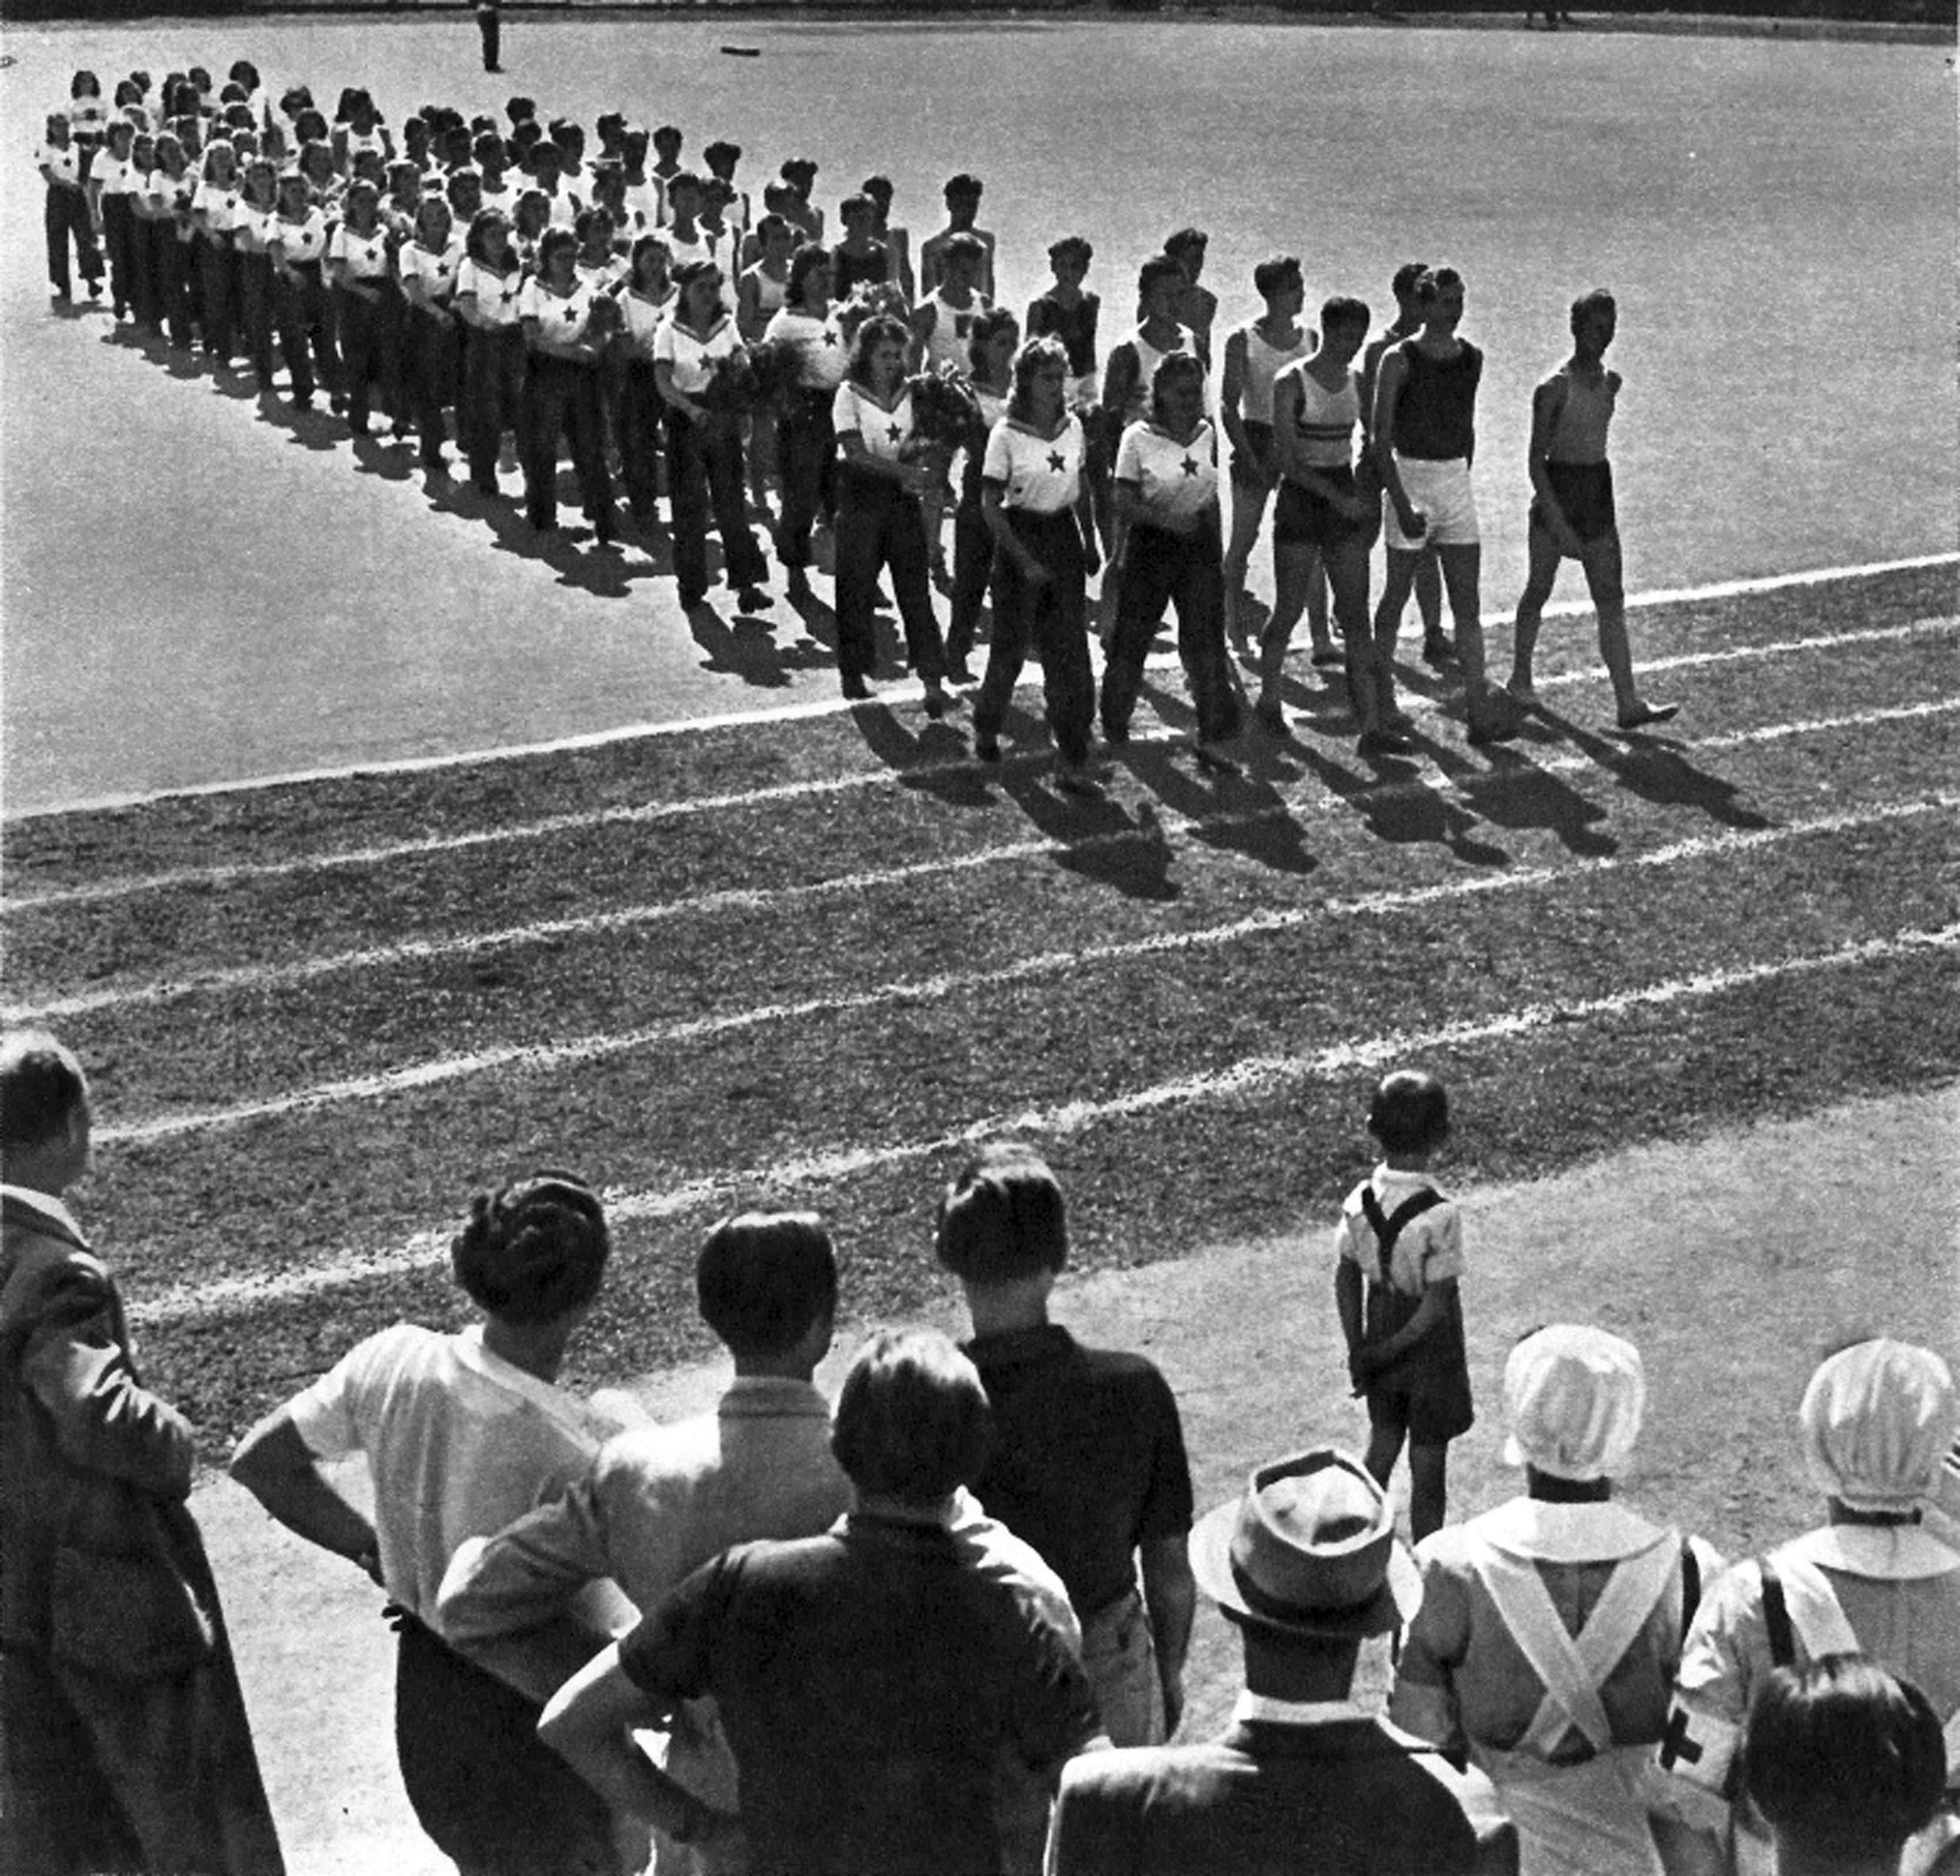 Parade of athletes